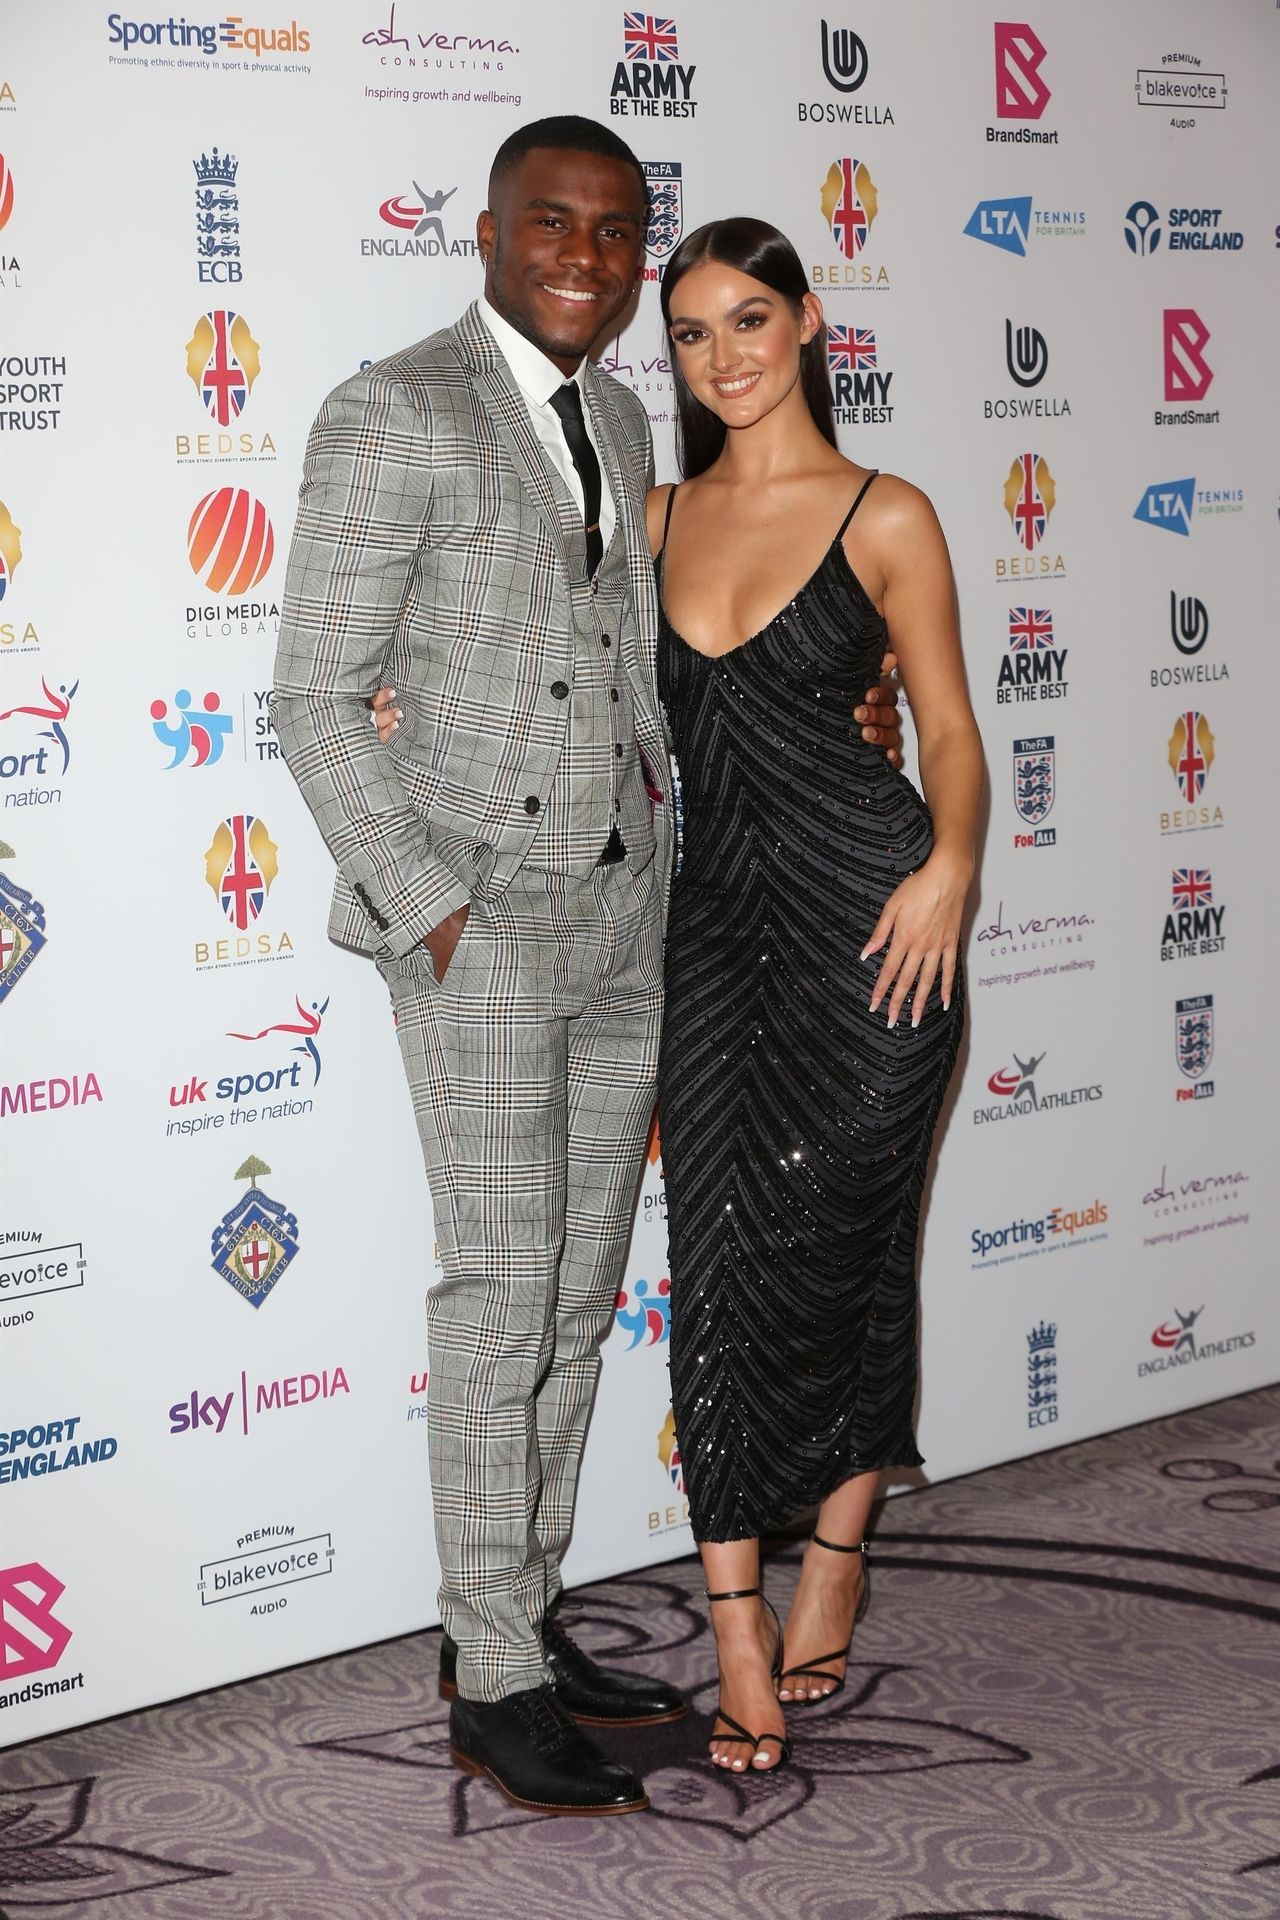 Siannise Fudge & Luke Trotman Are Seen At British Ethnic Diversity Sports Awards 0029